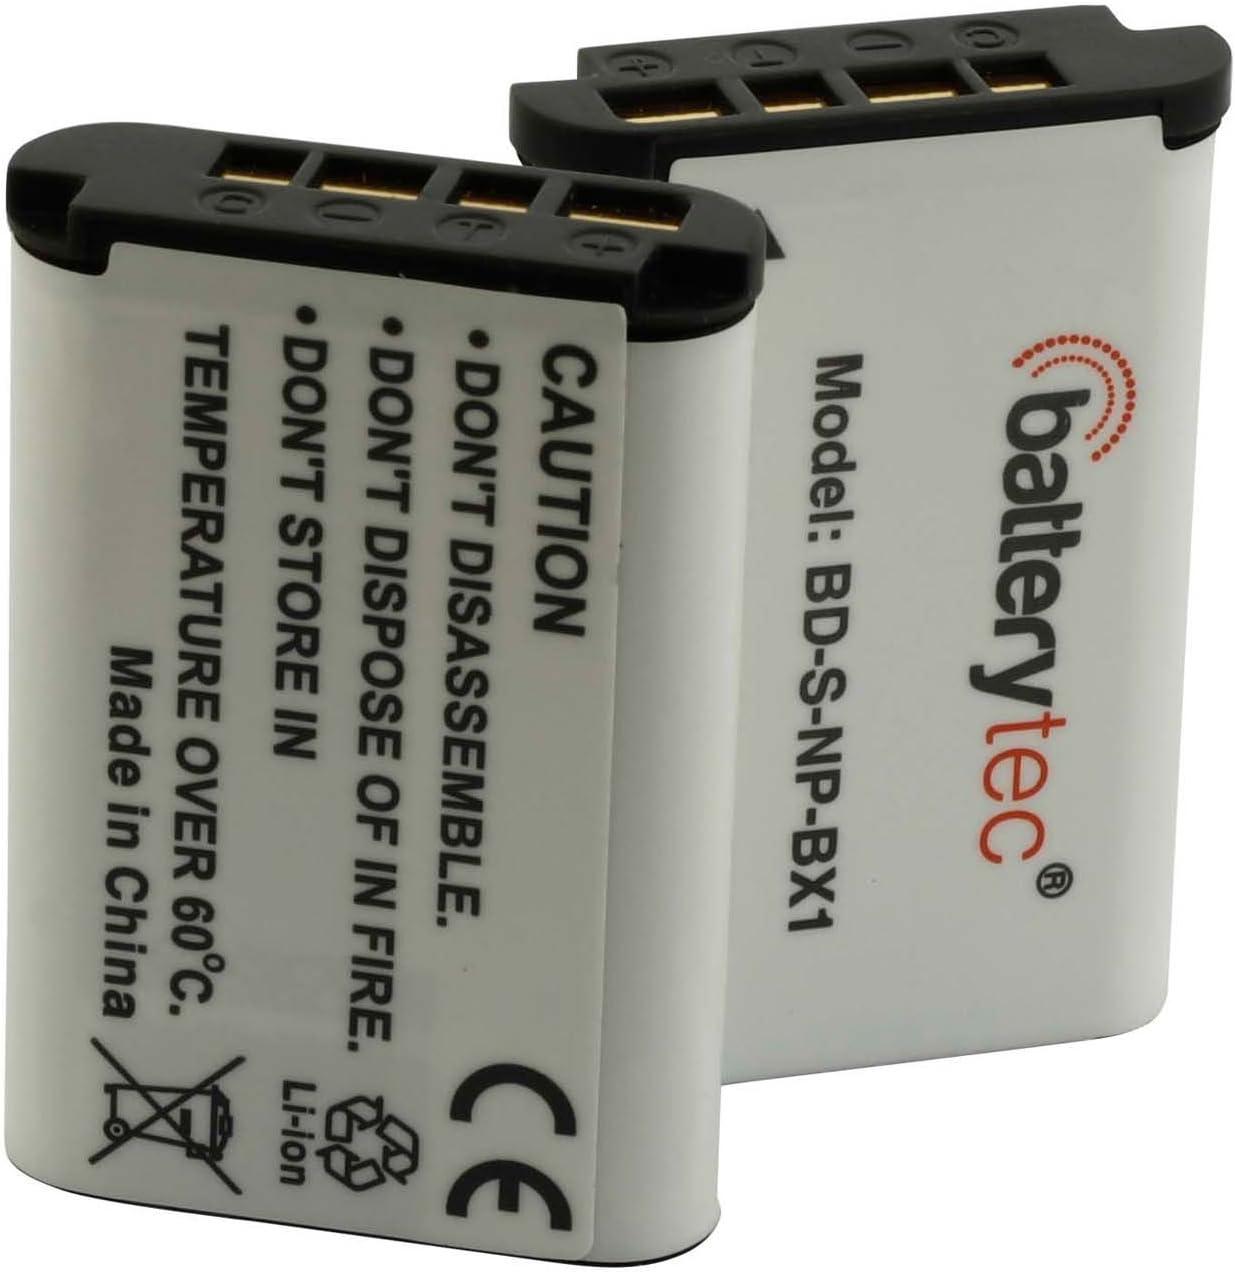 DSC-RX100 V Batterytec/® Bater/ía de Repuesto para Sony Cyber-Shot NP-BX1 DSC-RX100 NP-BX1//M8 DSC-RX100 III HDR-CX405 HDR-AS15 HDR-AS30V 2 Paquetes. 3.7V 1000mAh, Li-Ion, 12 Meses de garant/ía